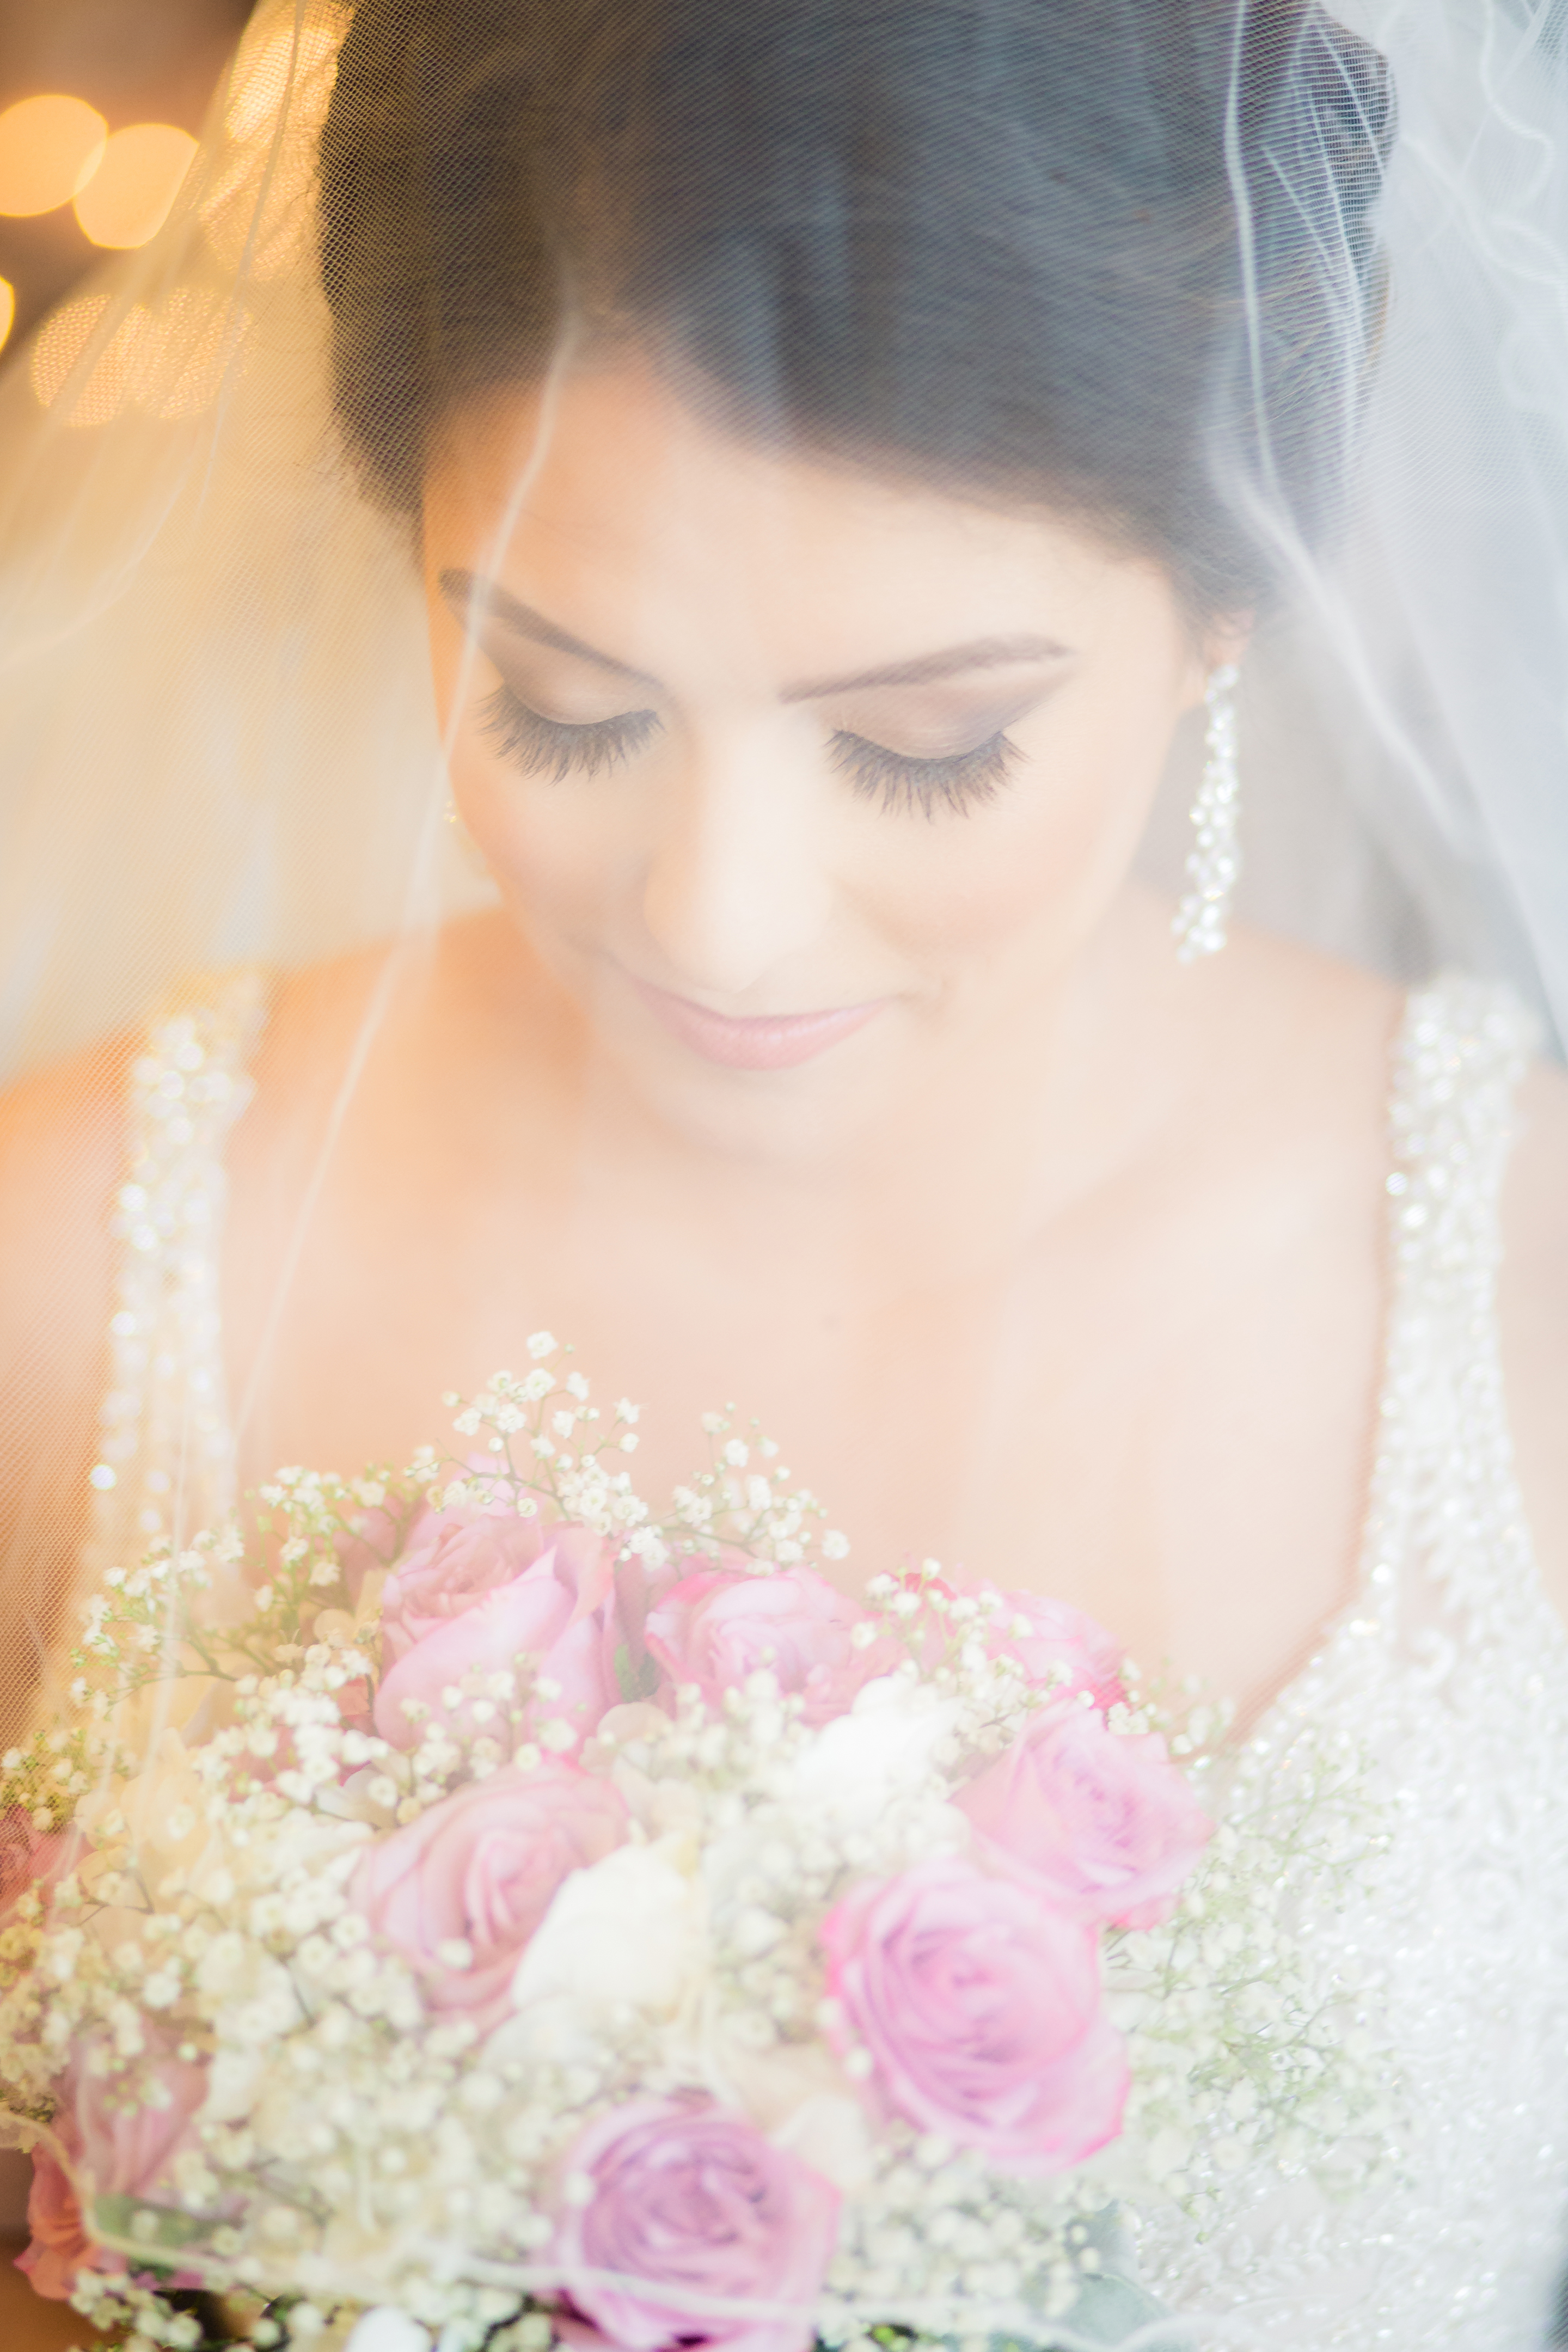 Butler's Courtyard Bridal Session | Jessica Pledger Photography | League City Wedding Venue